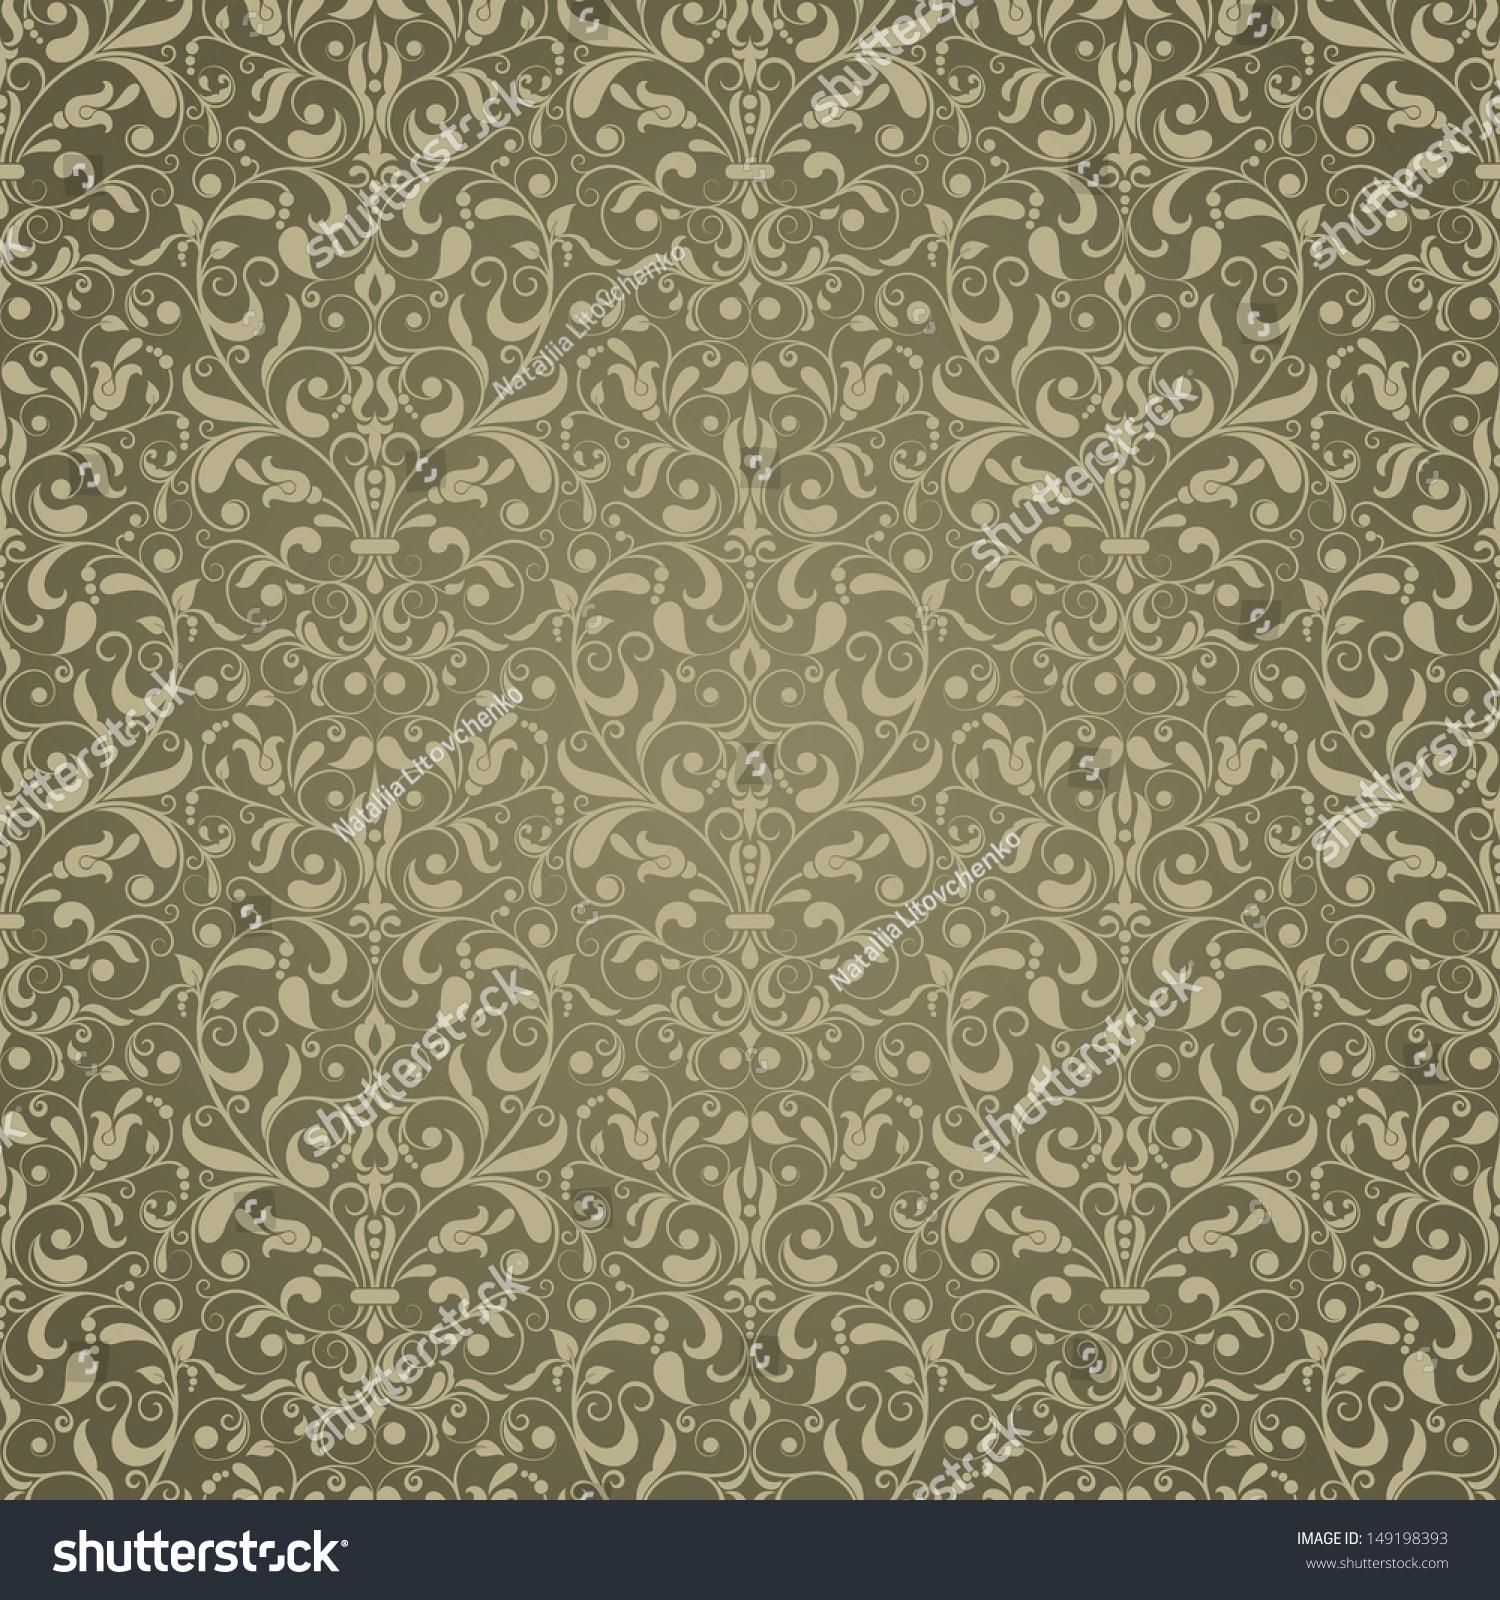 baroque print wallpaper - photo #35